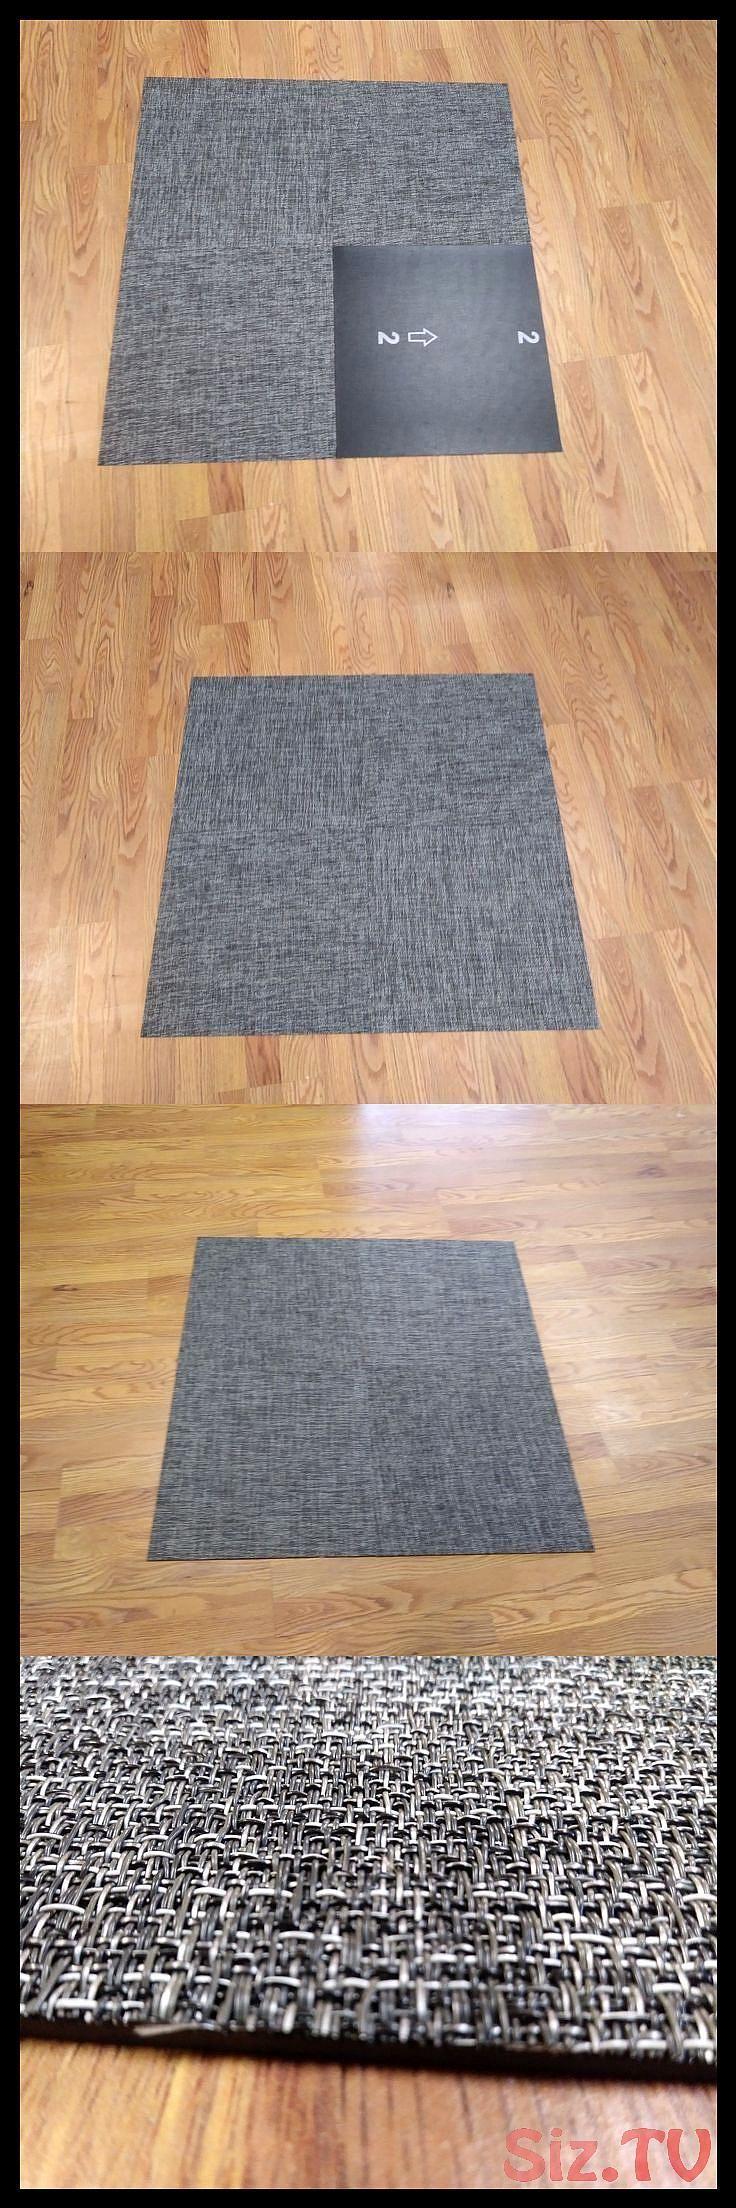 Latest Snap Shots Carpet Tiles Grey Thoughts Commercial Flooring Options Are Man Carpet Carpet Tiles Commercial Flooring Flooring Options